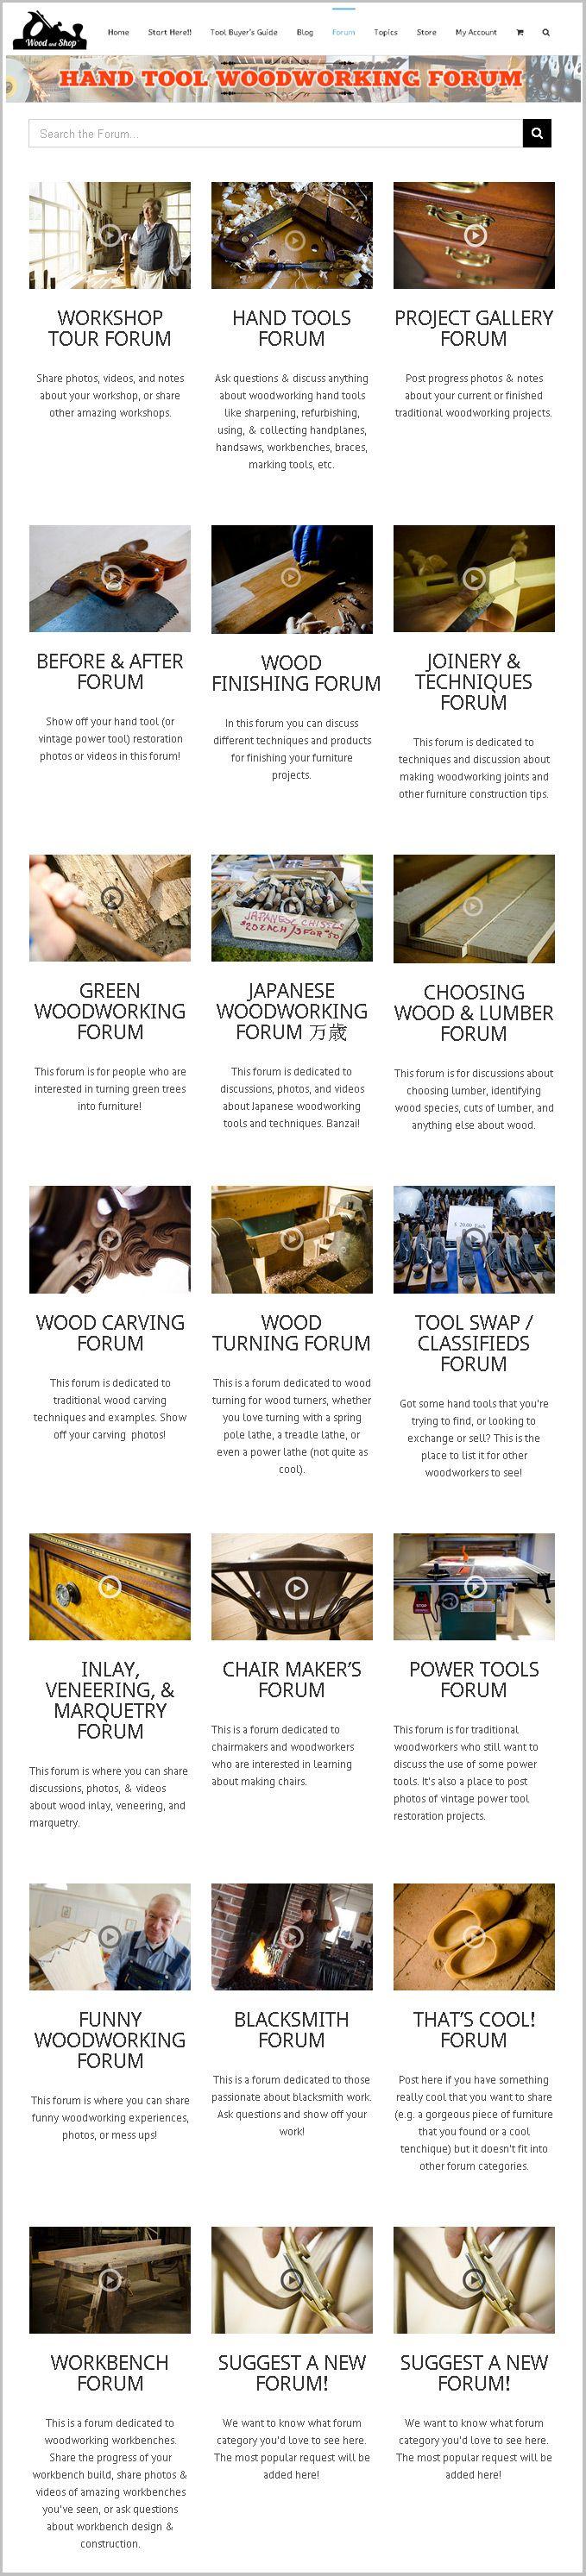 World's First Hand Tool Woodworking Forum! (WoodAndShop.com/Forum)